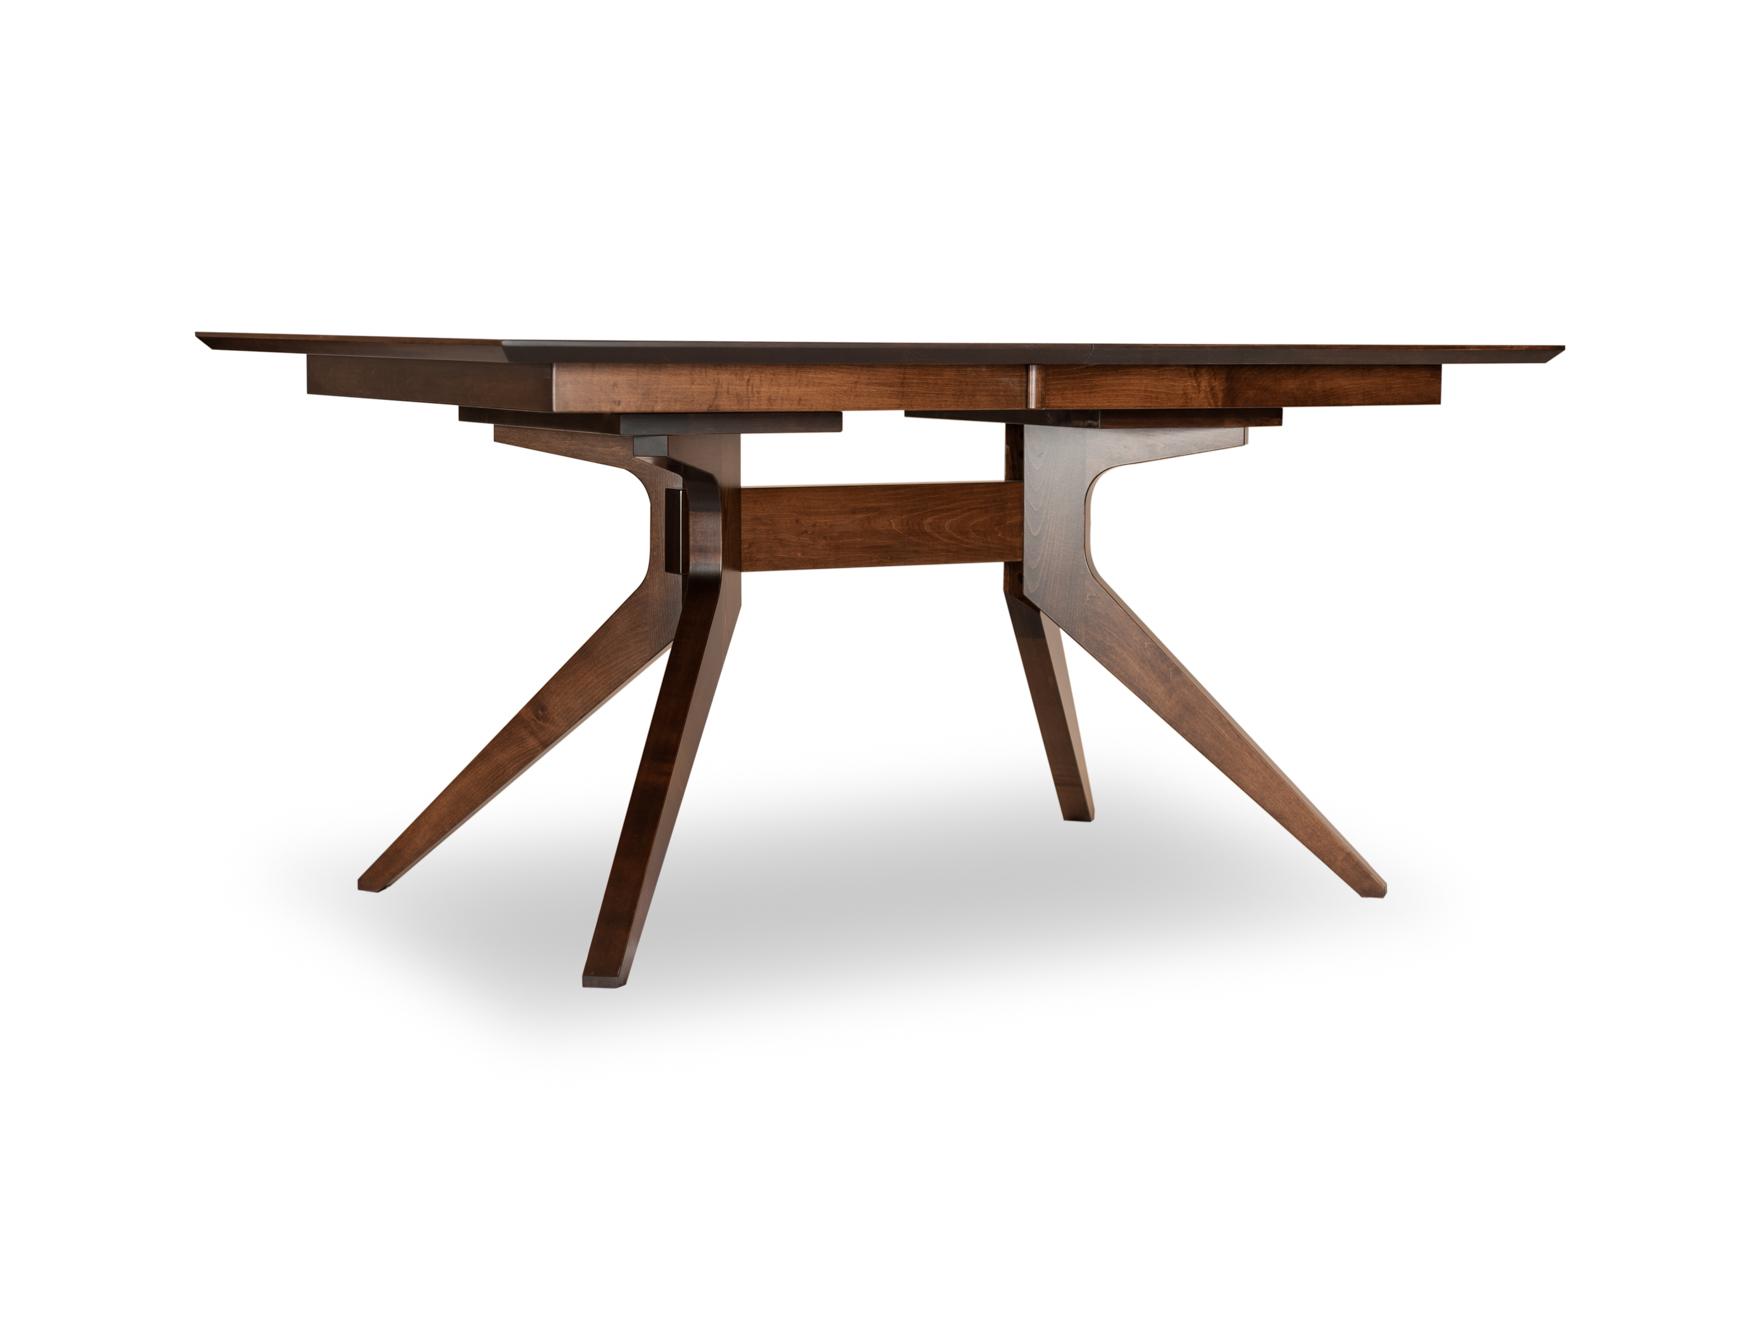 010_Woodcraft_Furniture_MalmoTable_FrtQtrB-1-1.jpg